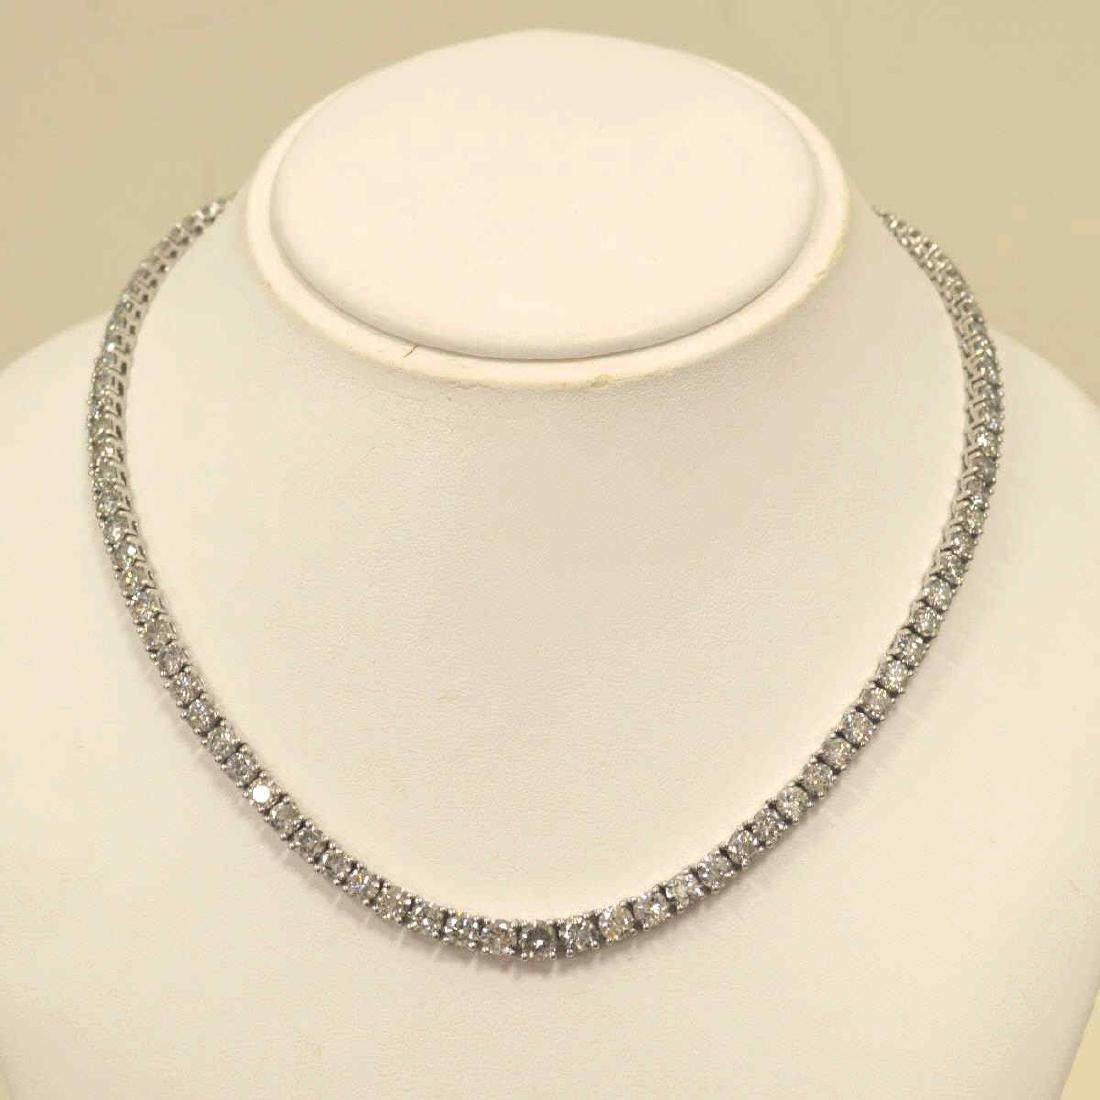 14kt white gold diamond tennis necklace